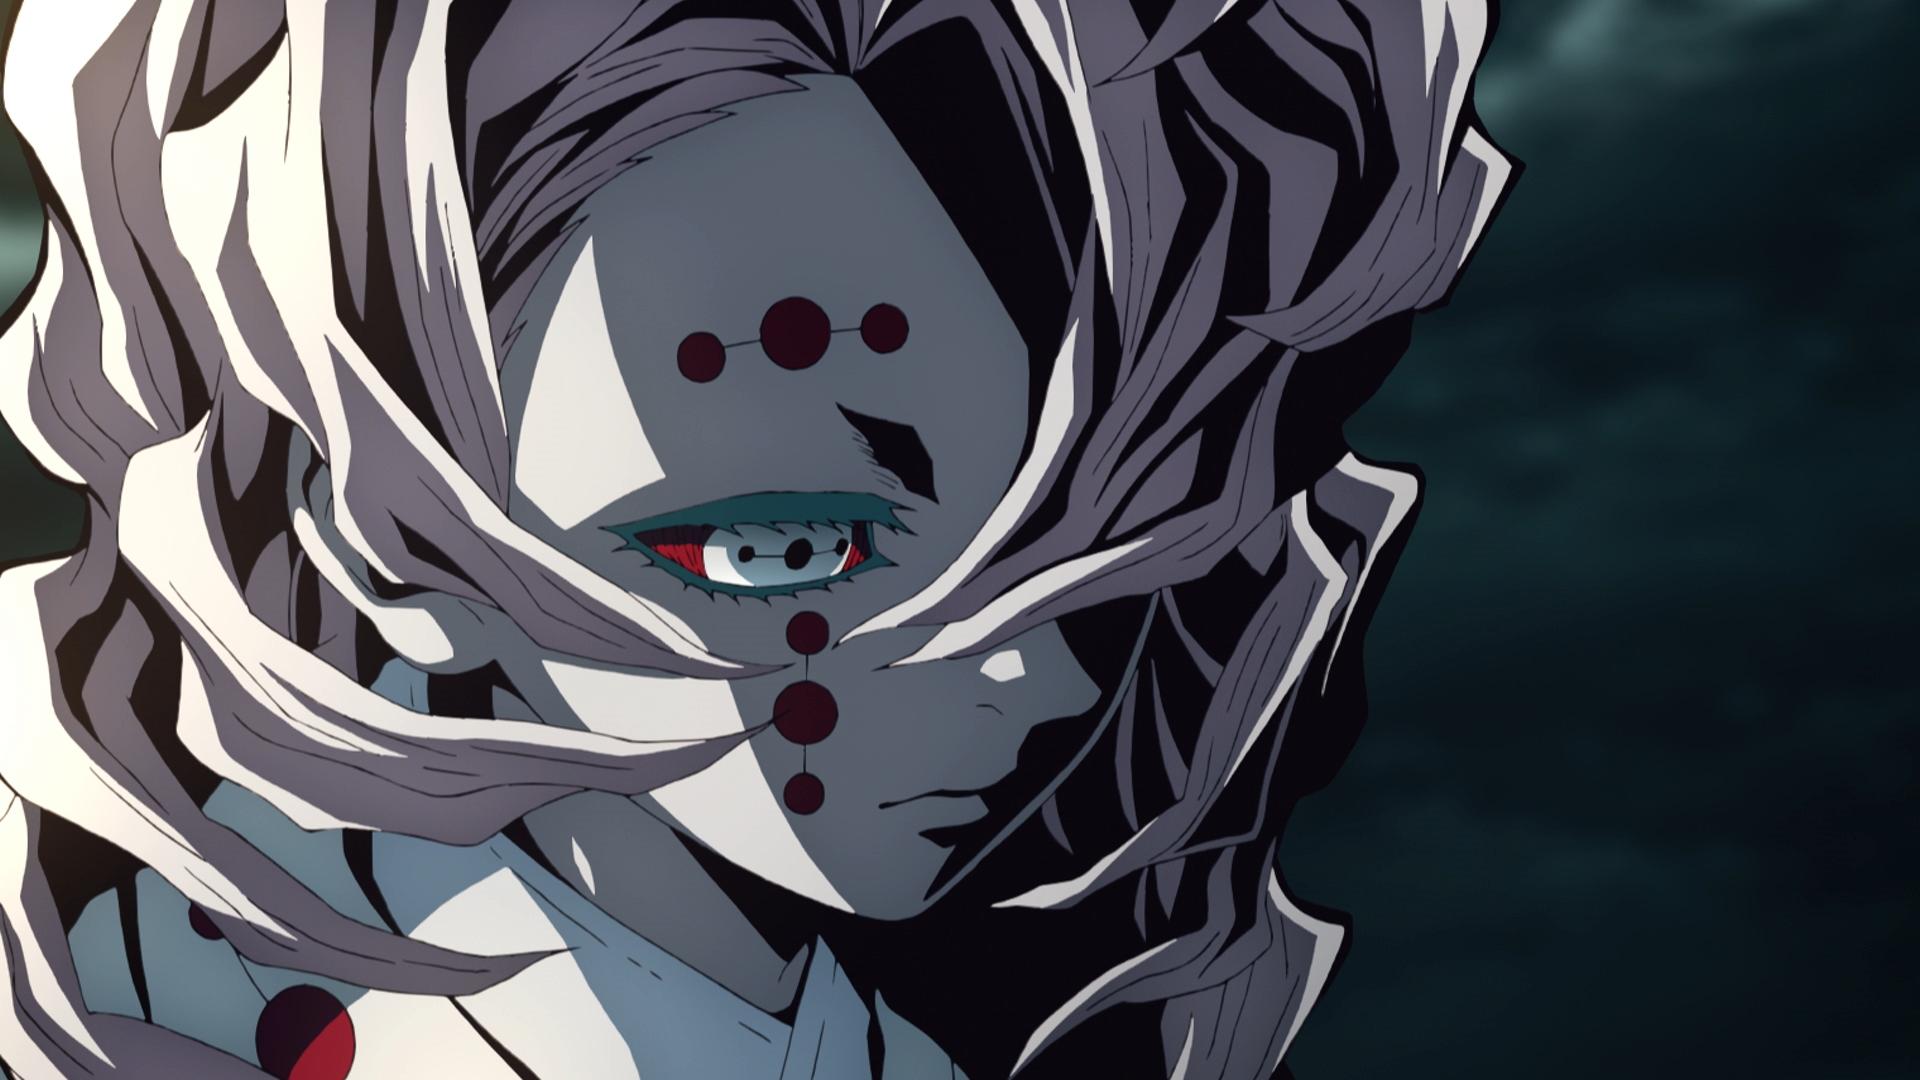 Tvアニメ 鬼滅の刃 次なる鬼 累を演じるのは内山昂輝さんに決定